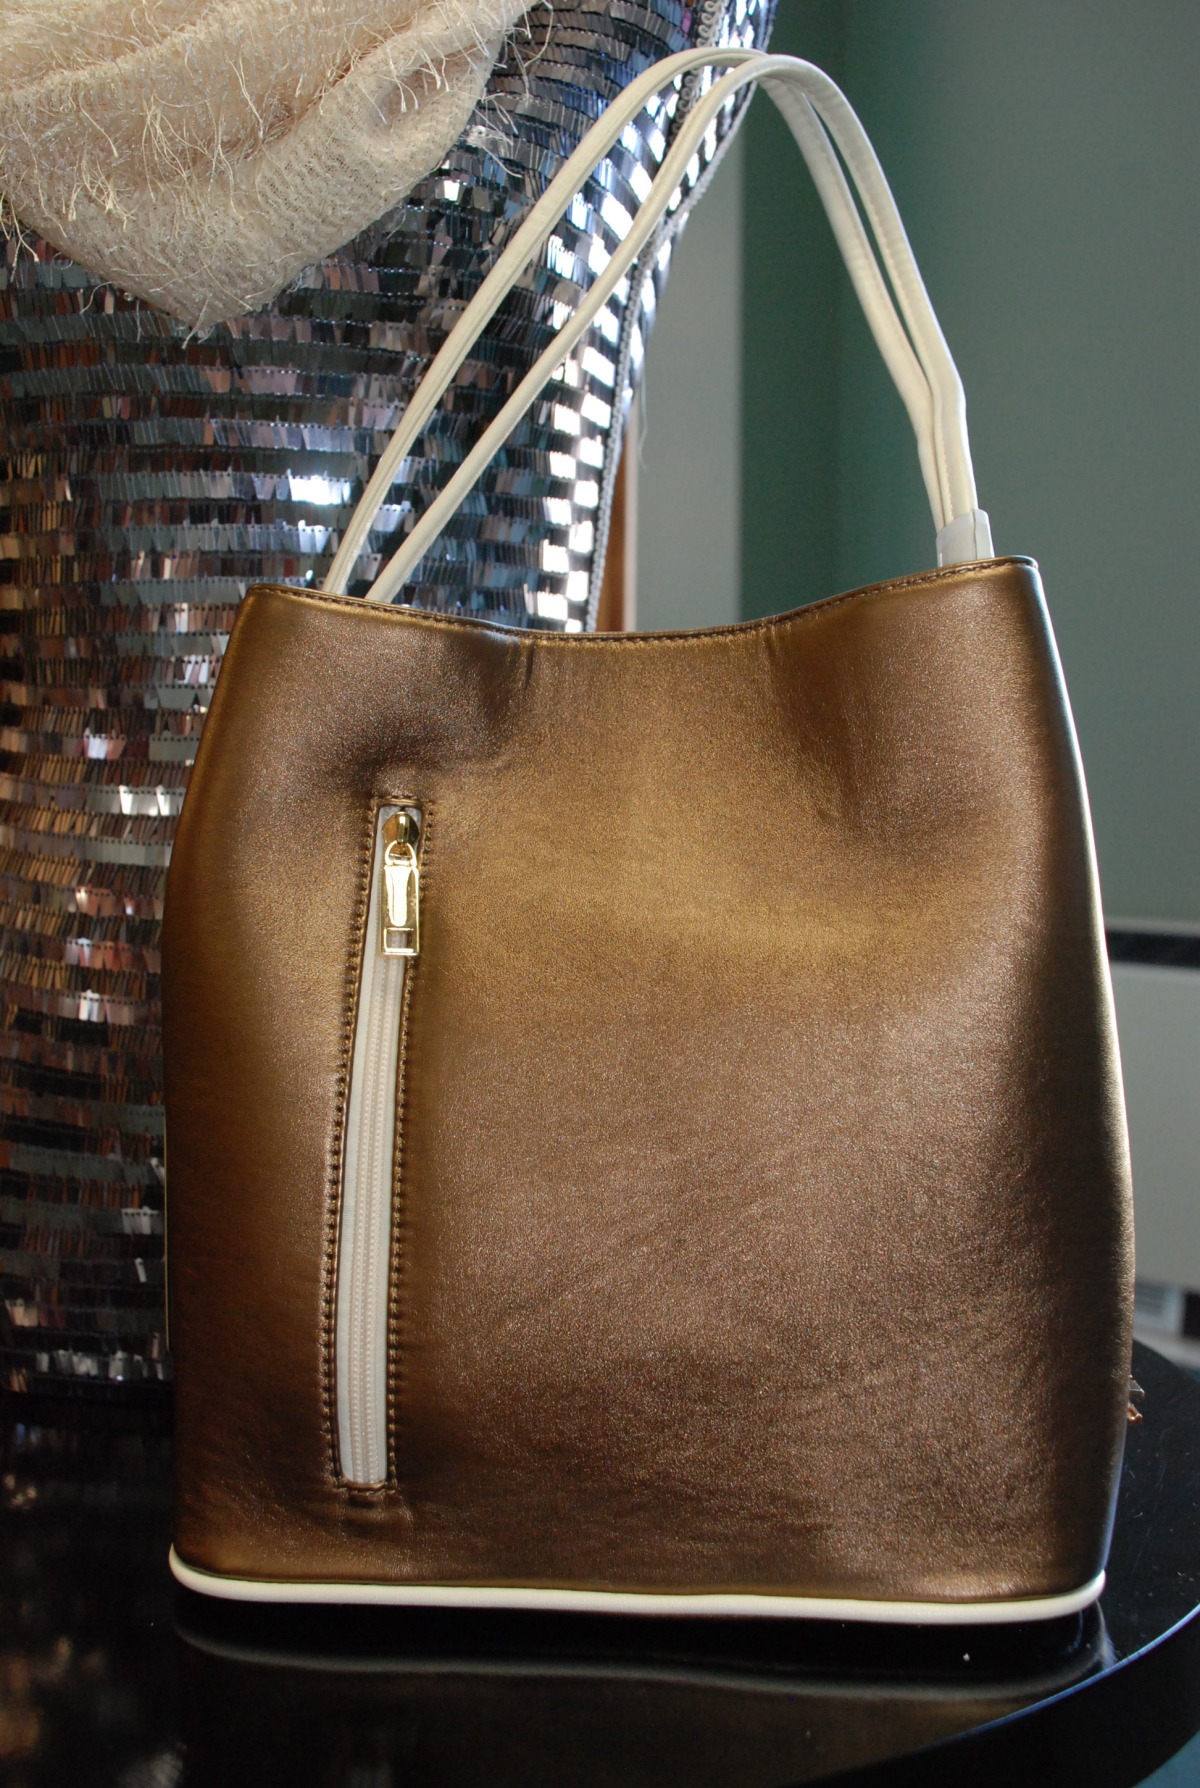 samoe handbags with adjustable straps.jpg